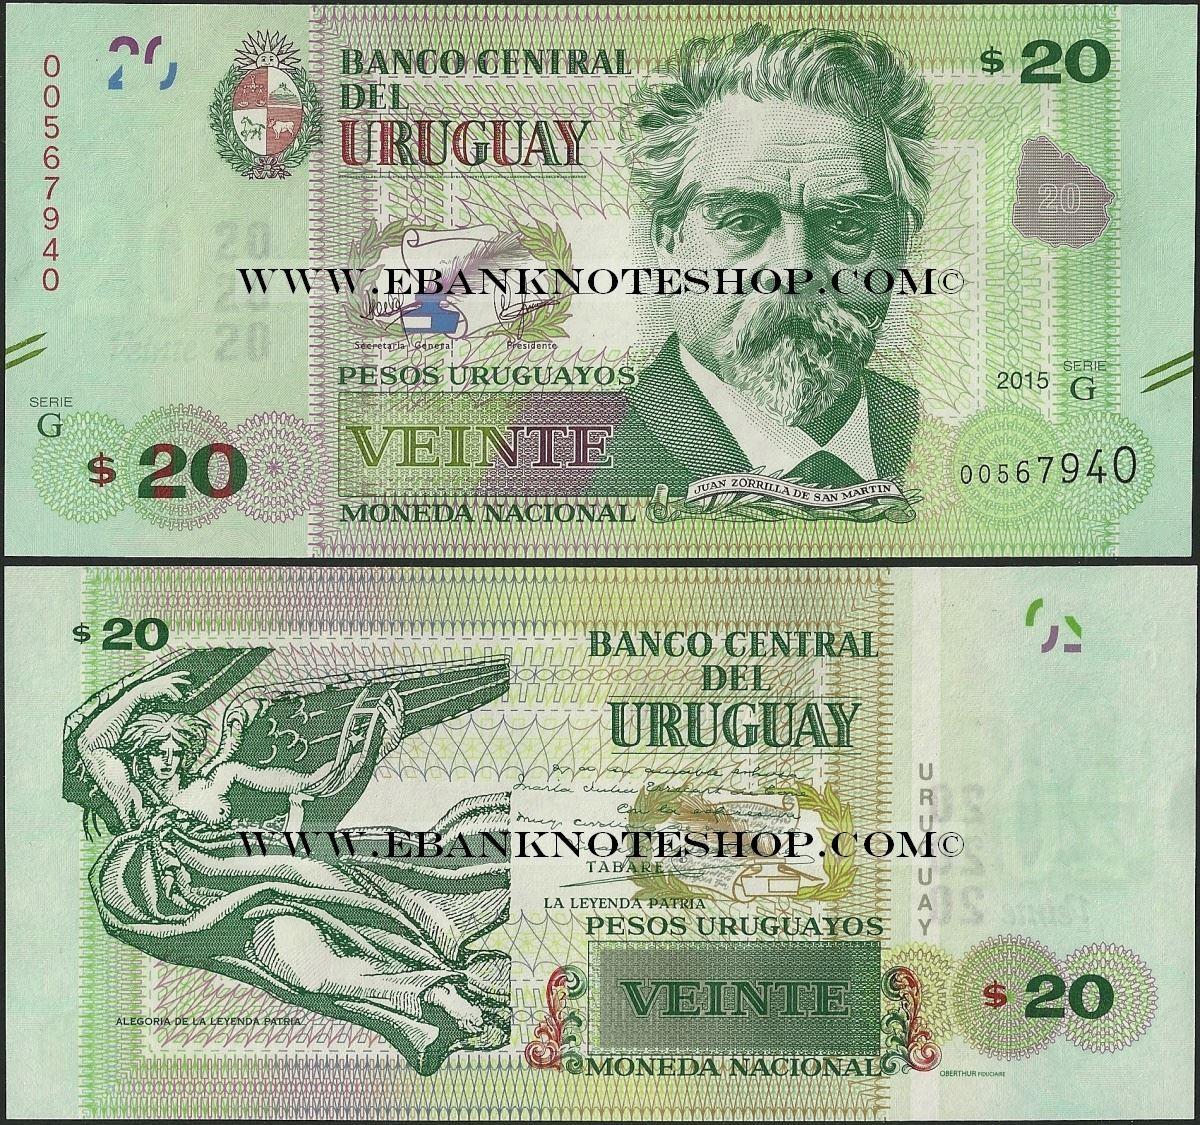 Ebanknoteshop. Uruguay,P099,B558,2000 Pesos Uruguayos,2015